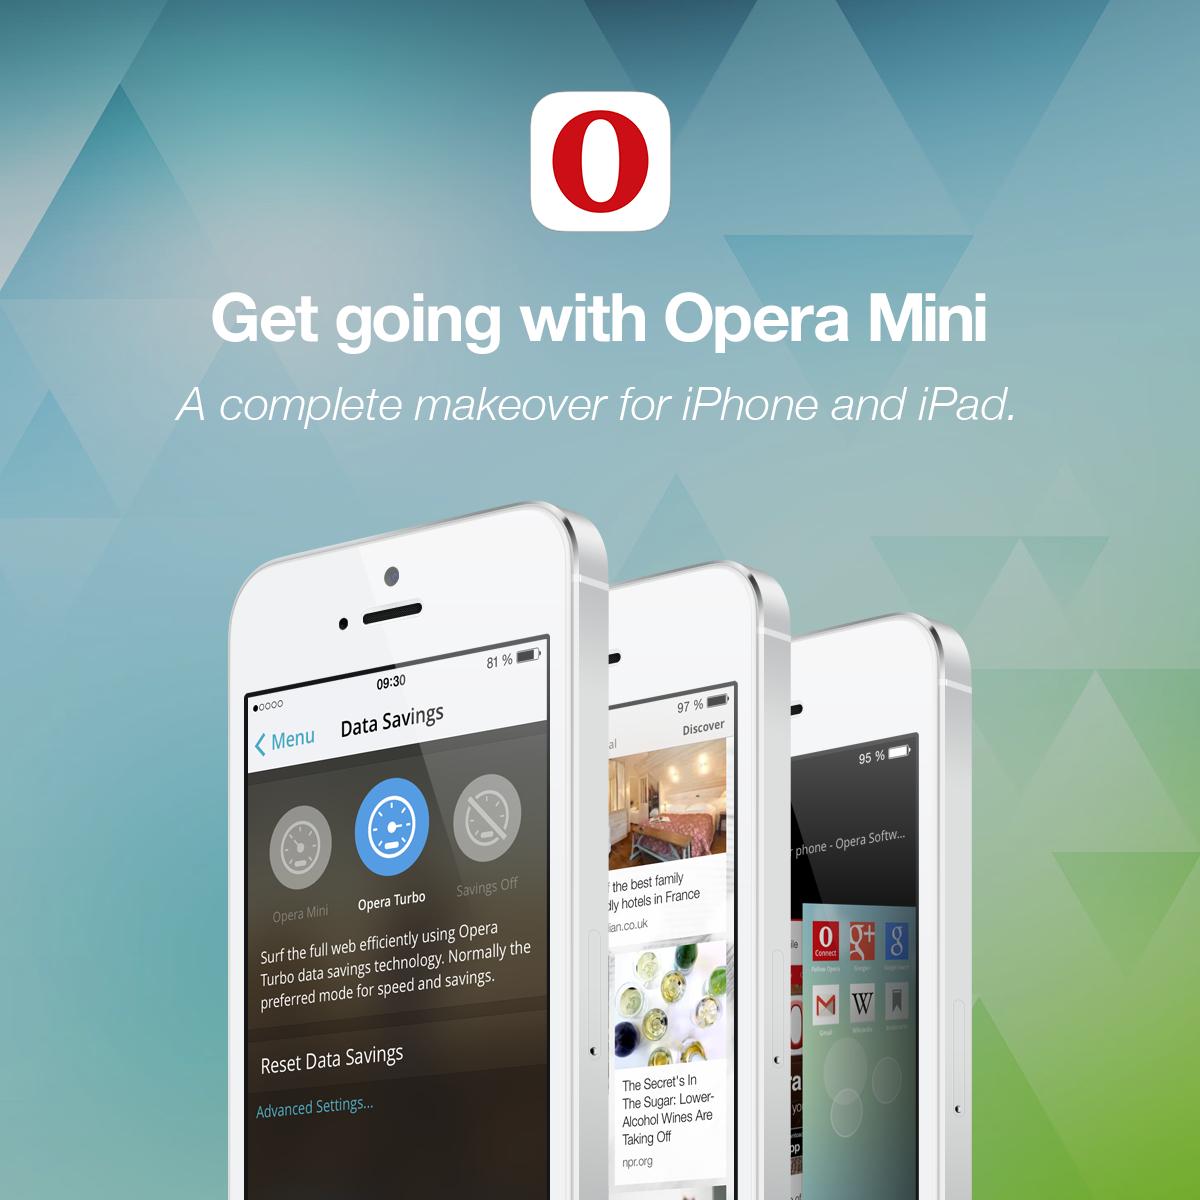 Opera Mini App for iPhone, iPad, and Mac Devices